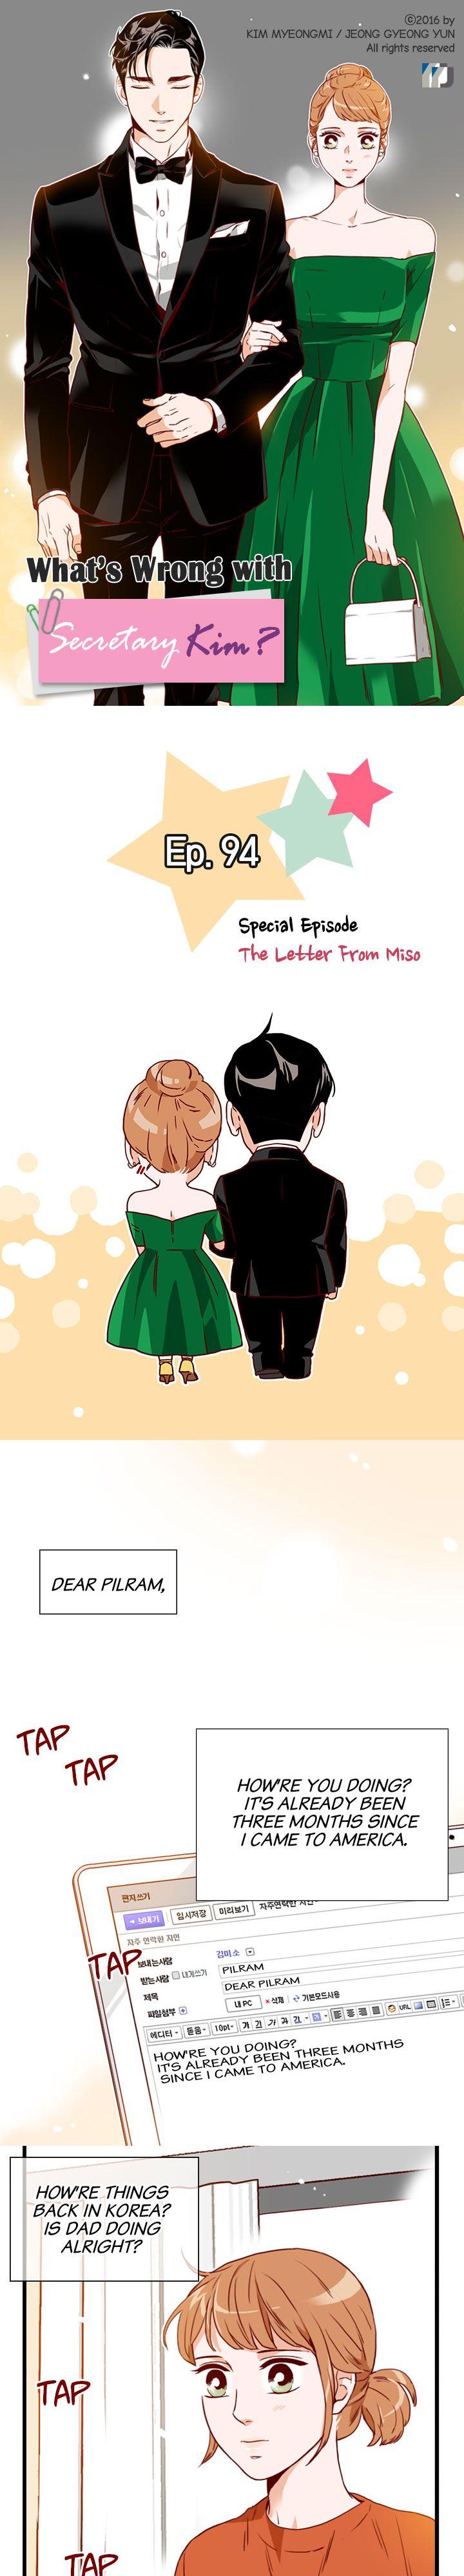 https://manga.mangadogs.com/comics/pic2/15/25807/960751/8c4b0479f20772cb9b68cf5f161d1e6f.jpg Page 1